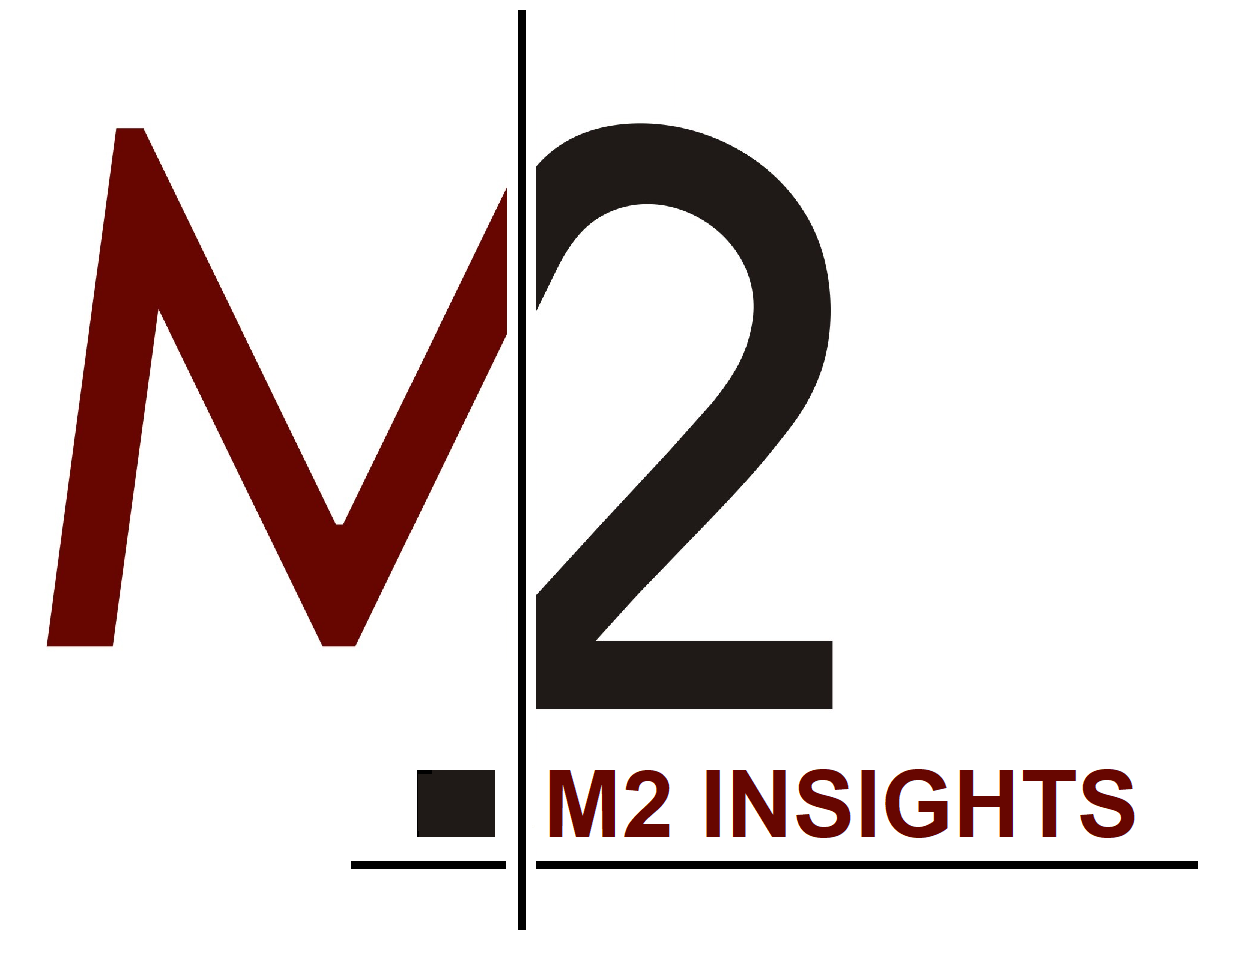 M2 INSIGHTS